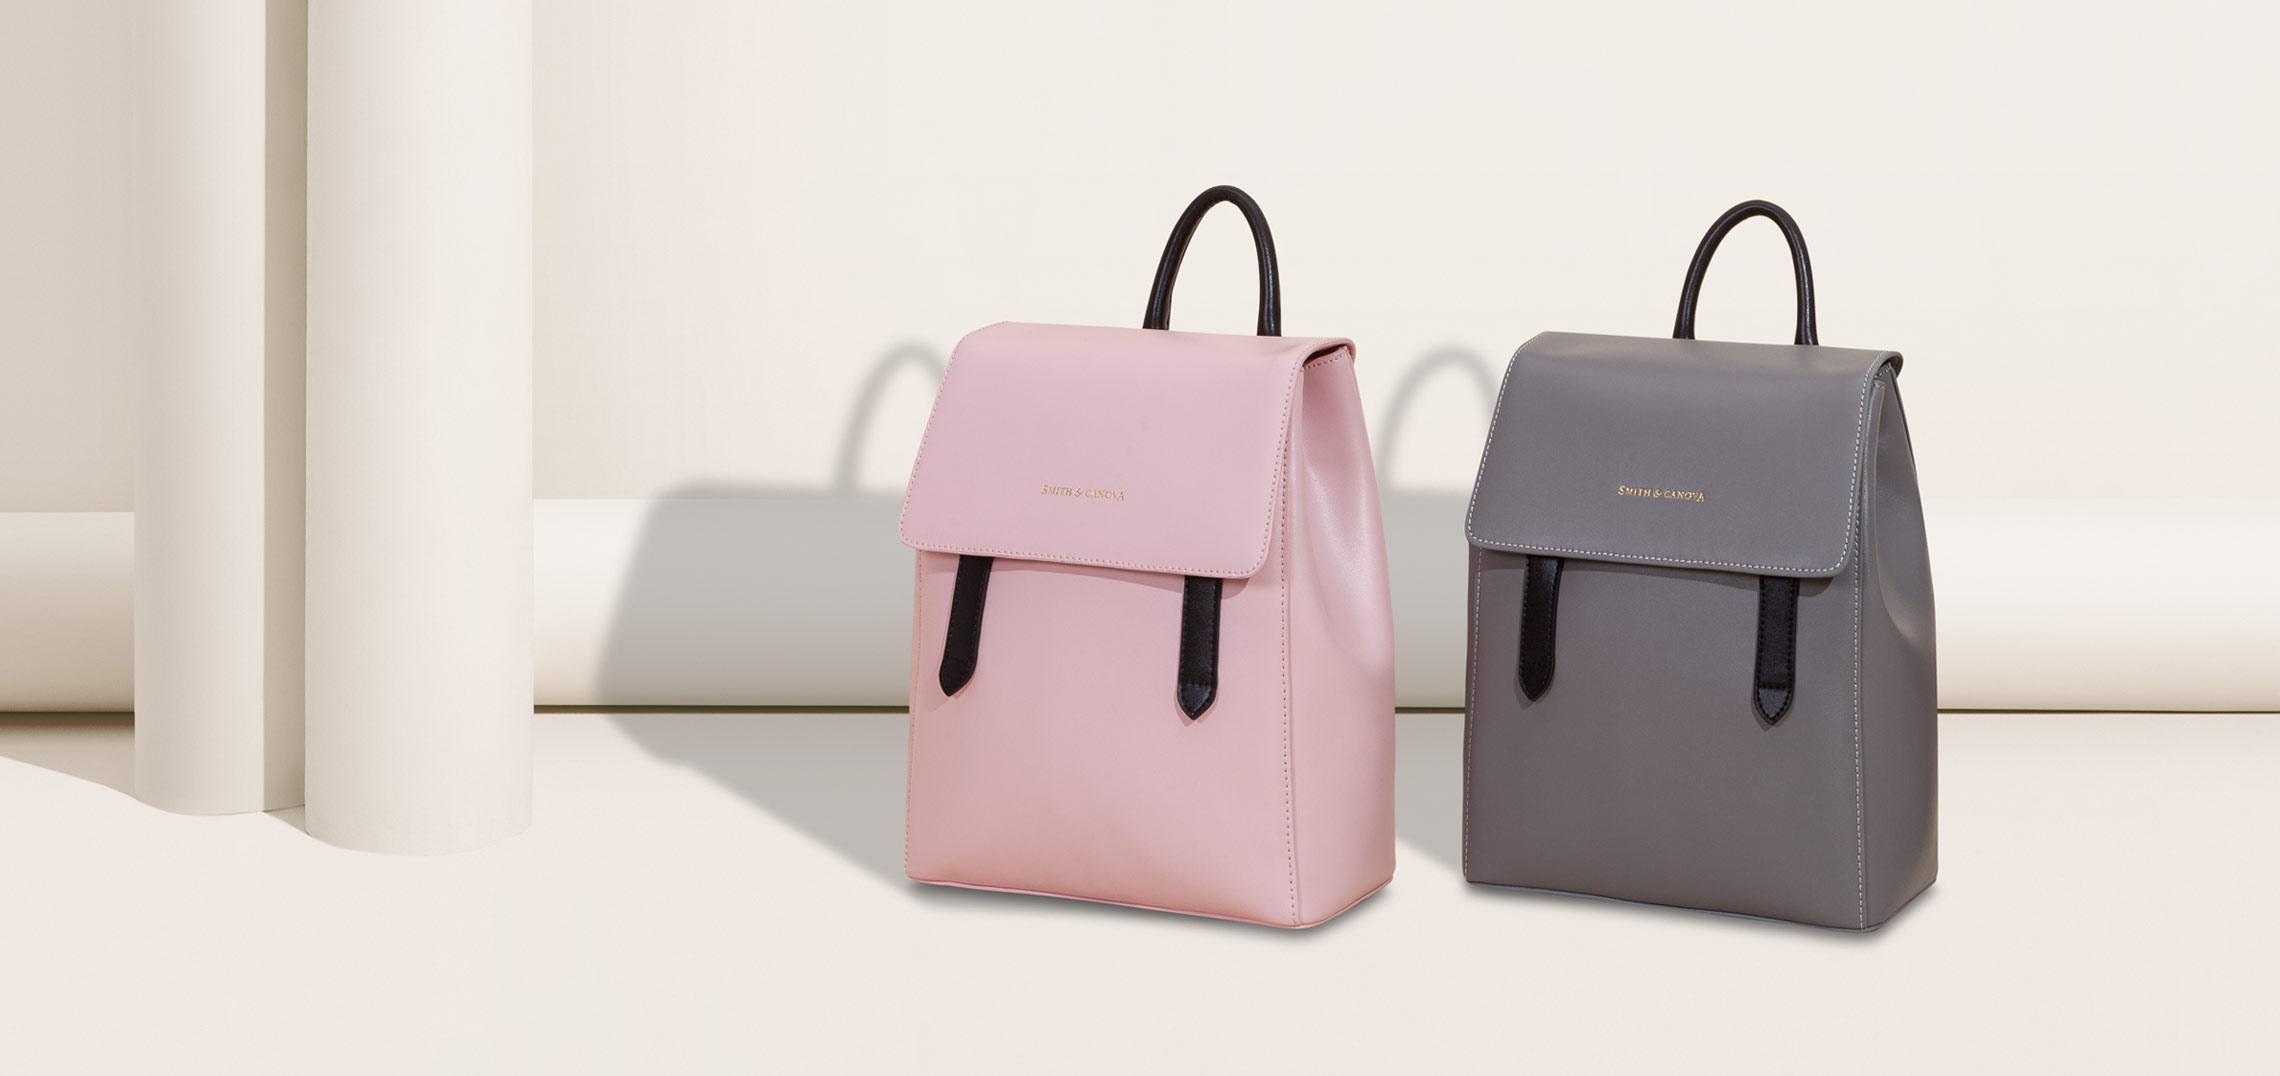 Smith & Canova - Josephine Collection